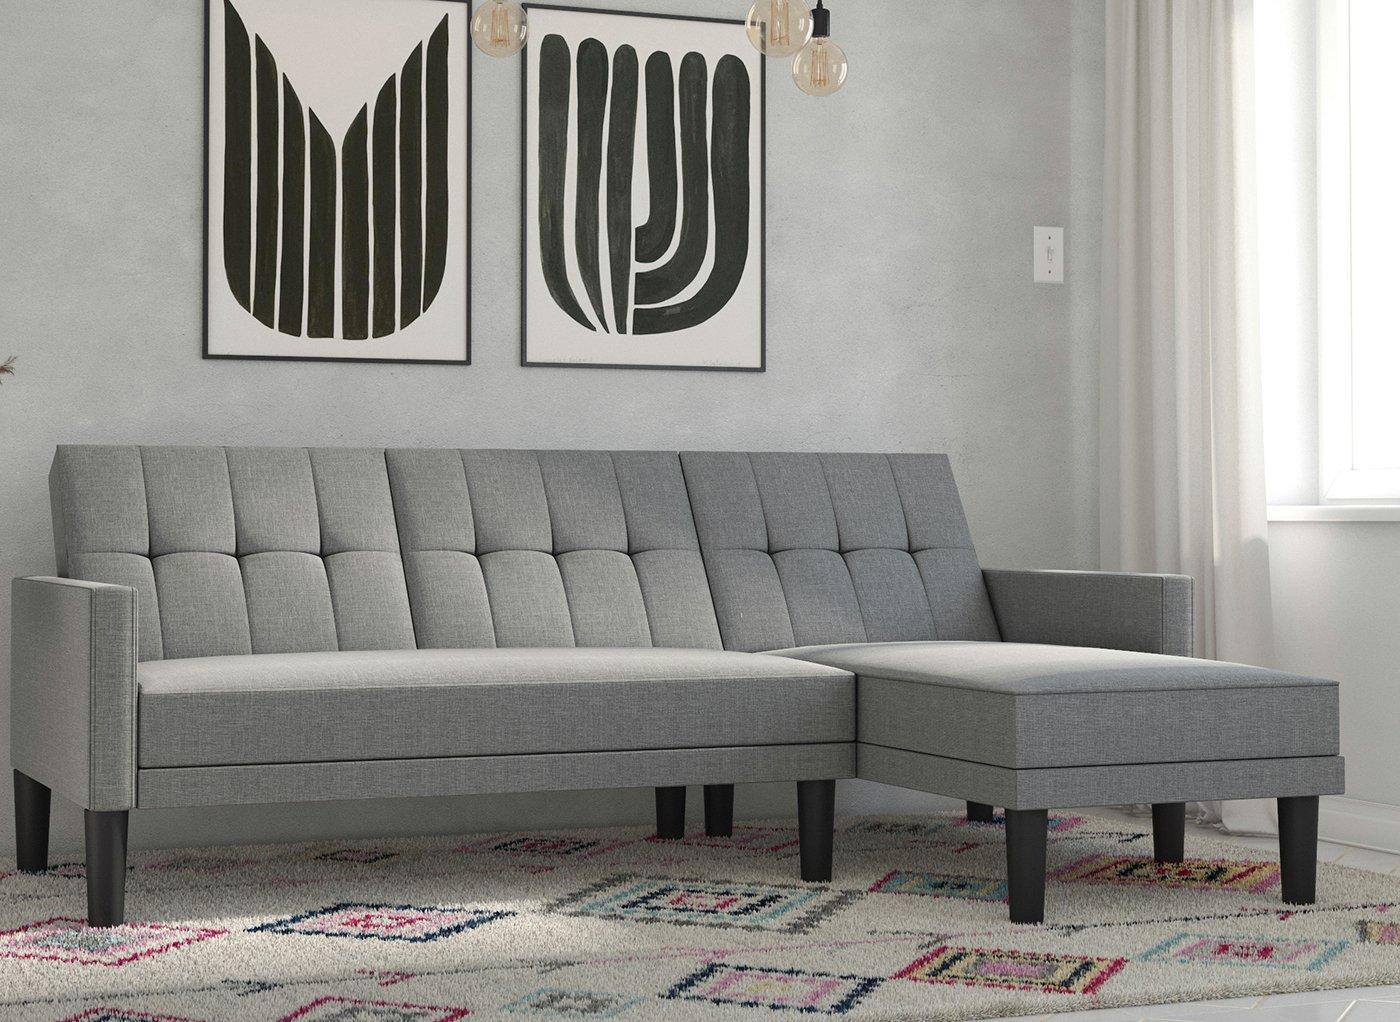 Valentina 3 Seater Clic-Clac Corner Sofa Bed (£399)